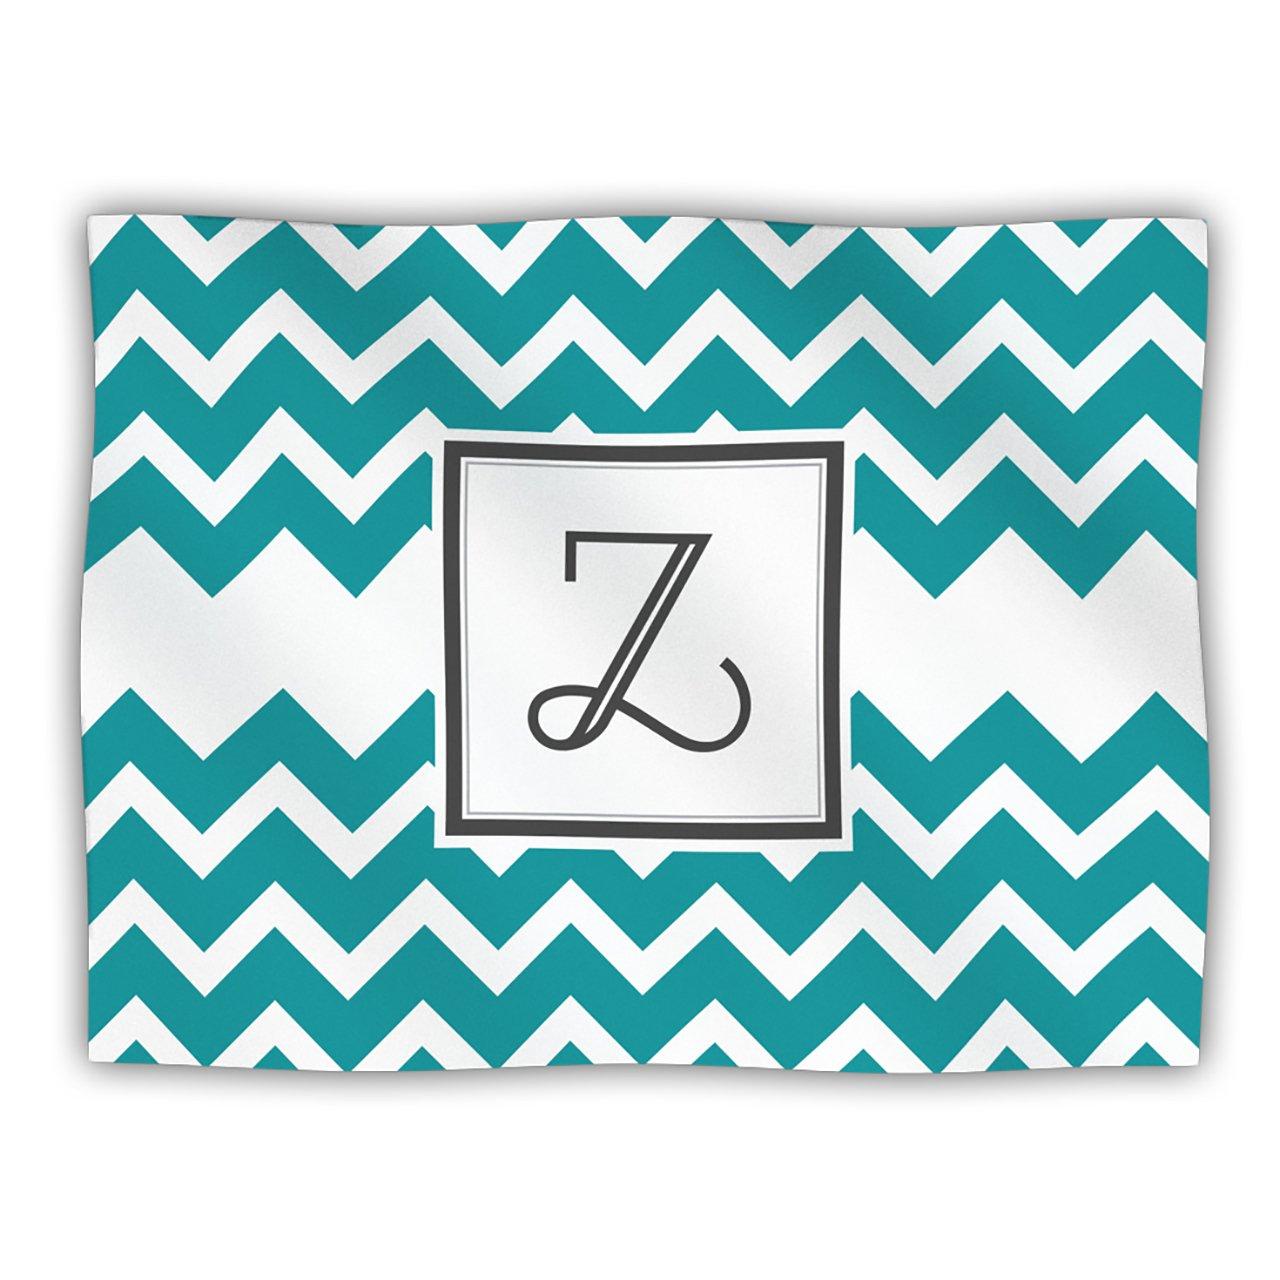 Kess InHouse KESS Original 'Monogram Chevron Teal Letter Z' Dog Blanket, 40 by 30-Inch